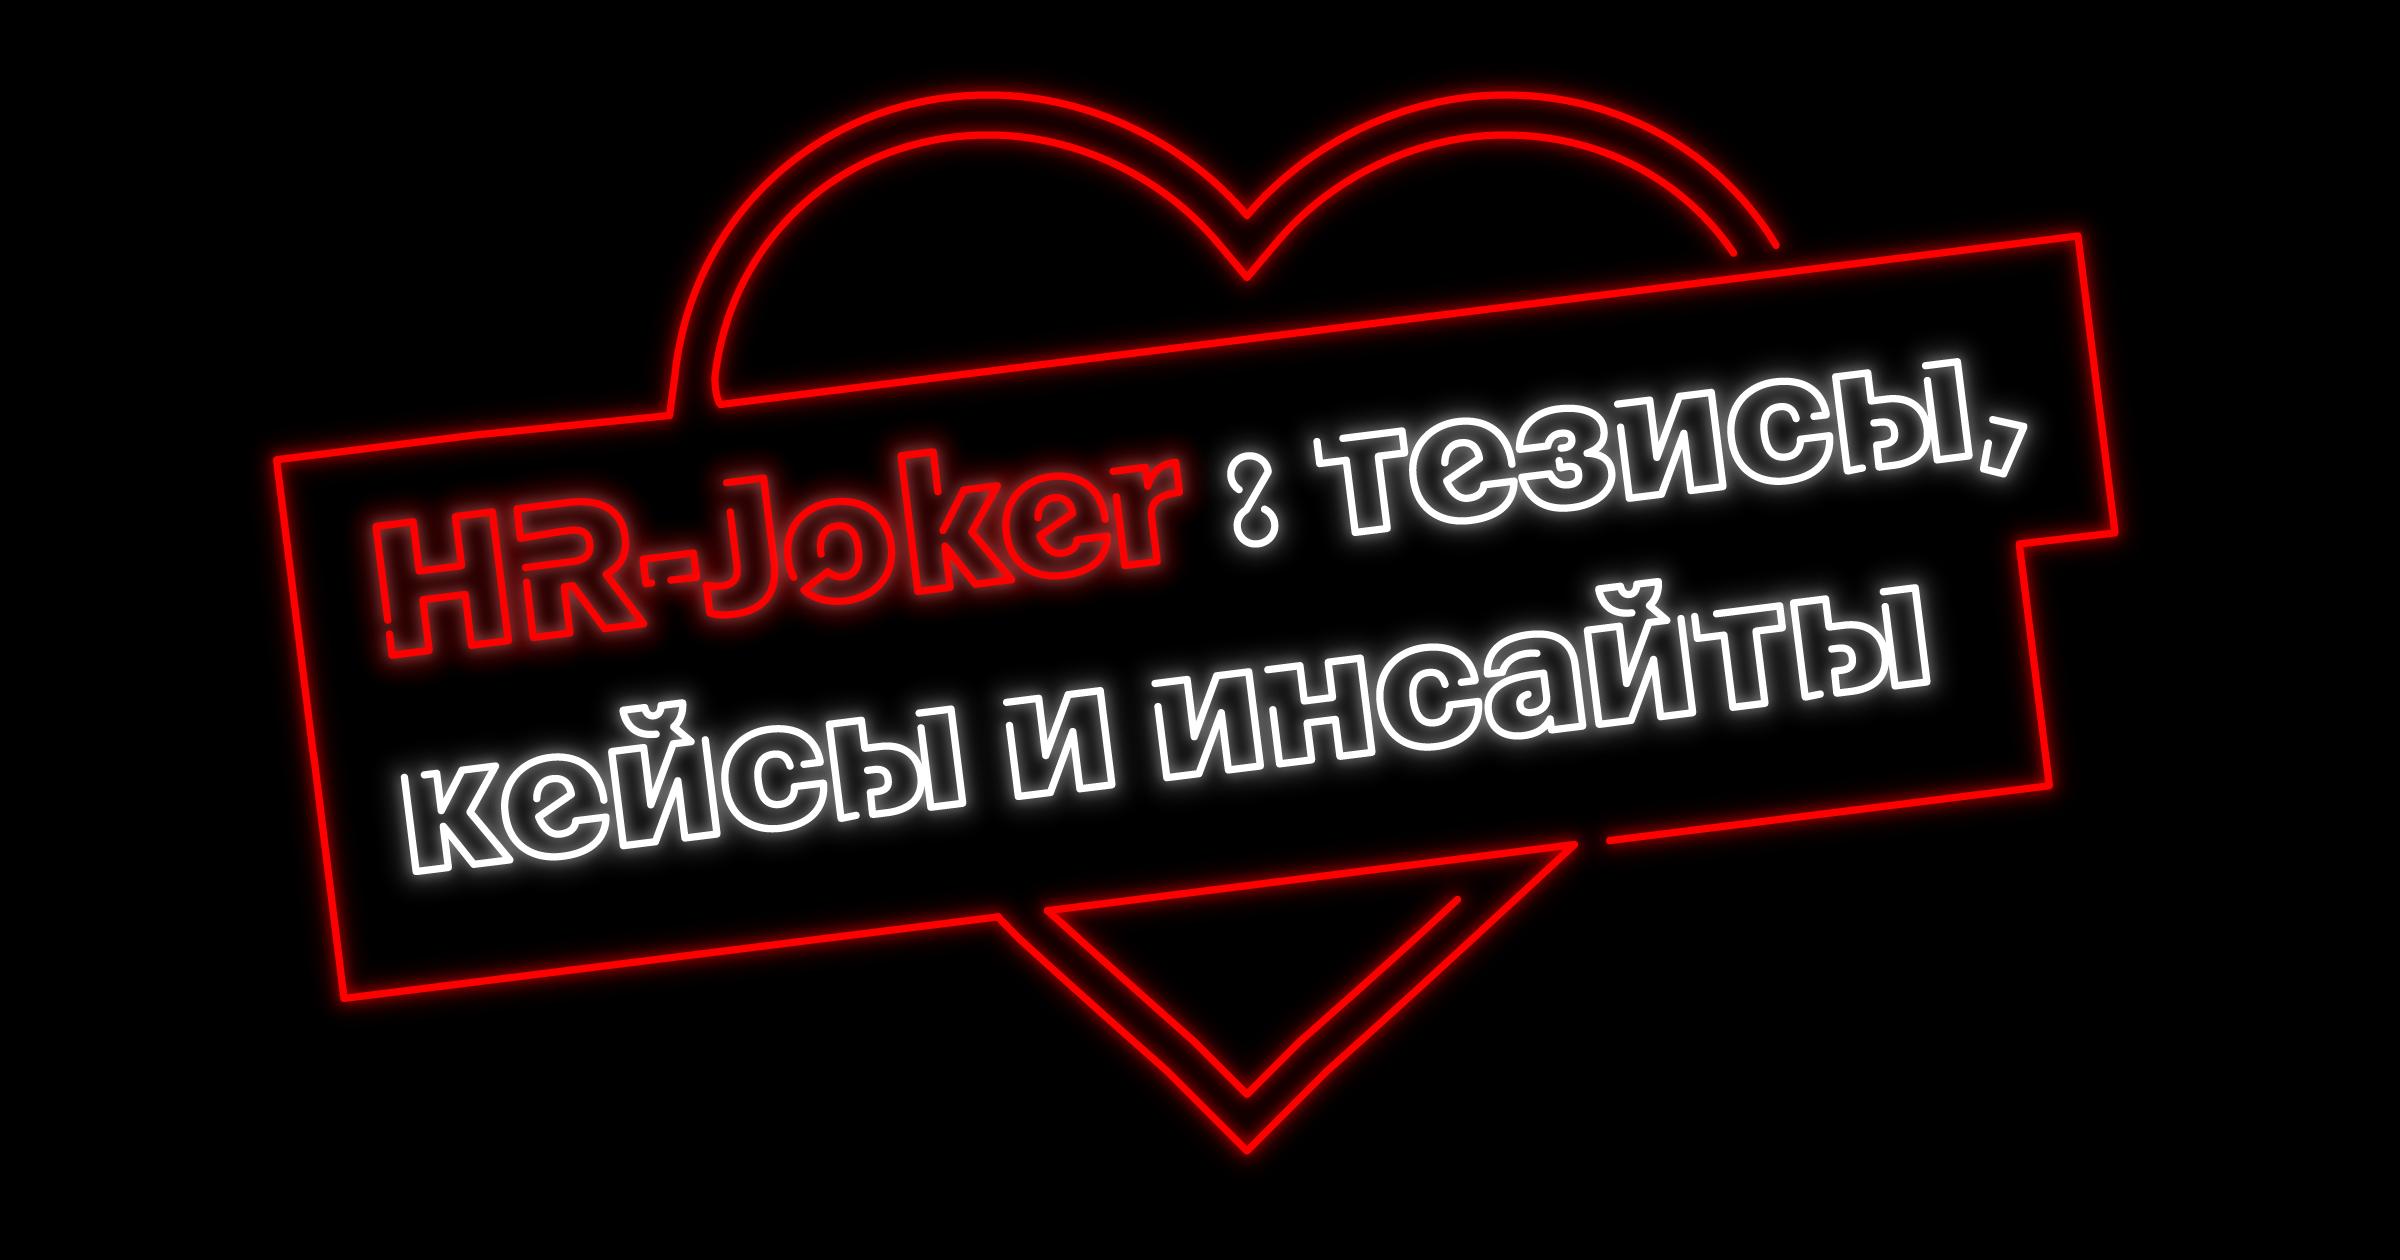 HR-Joker: тезисы, кейсы и инсайты